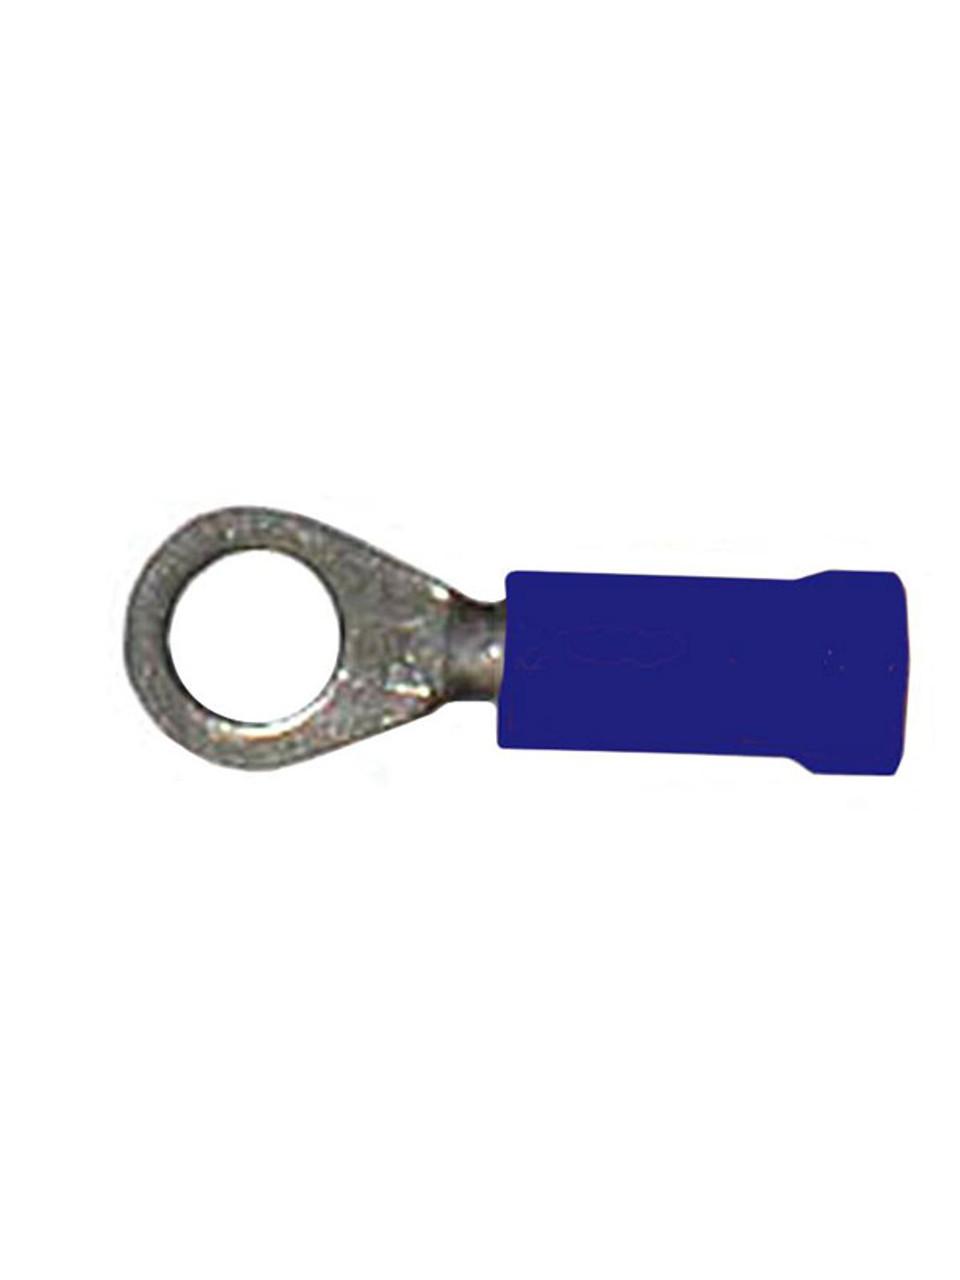 BR-10 --- Blue Ring # 10 Terminal